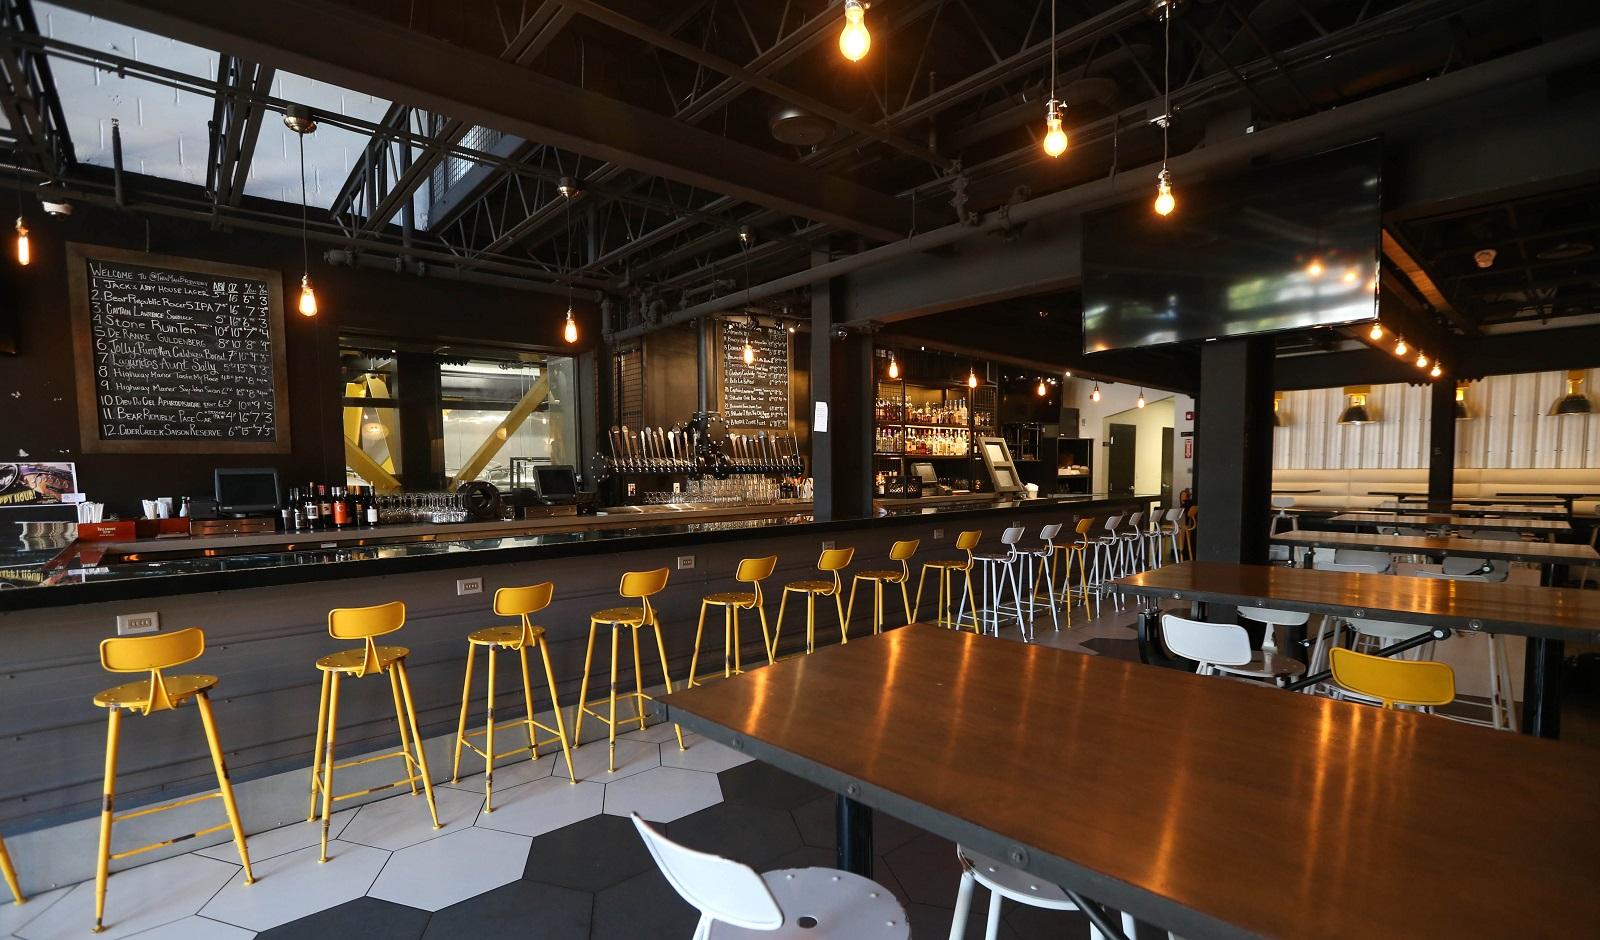 The downstairs bar area in new Elmwood Avenue brewery-restaurant Thin Man. (Sharon Cantillon/Buffalo News)